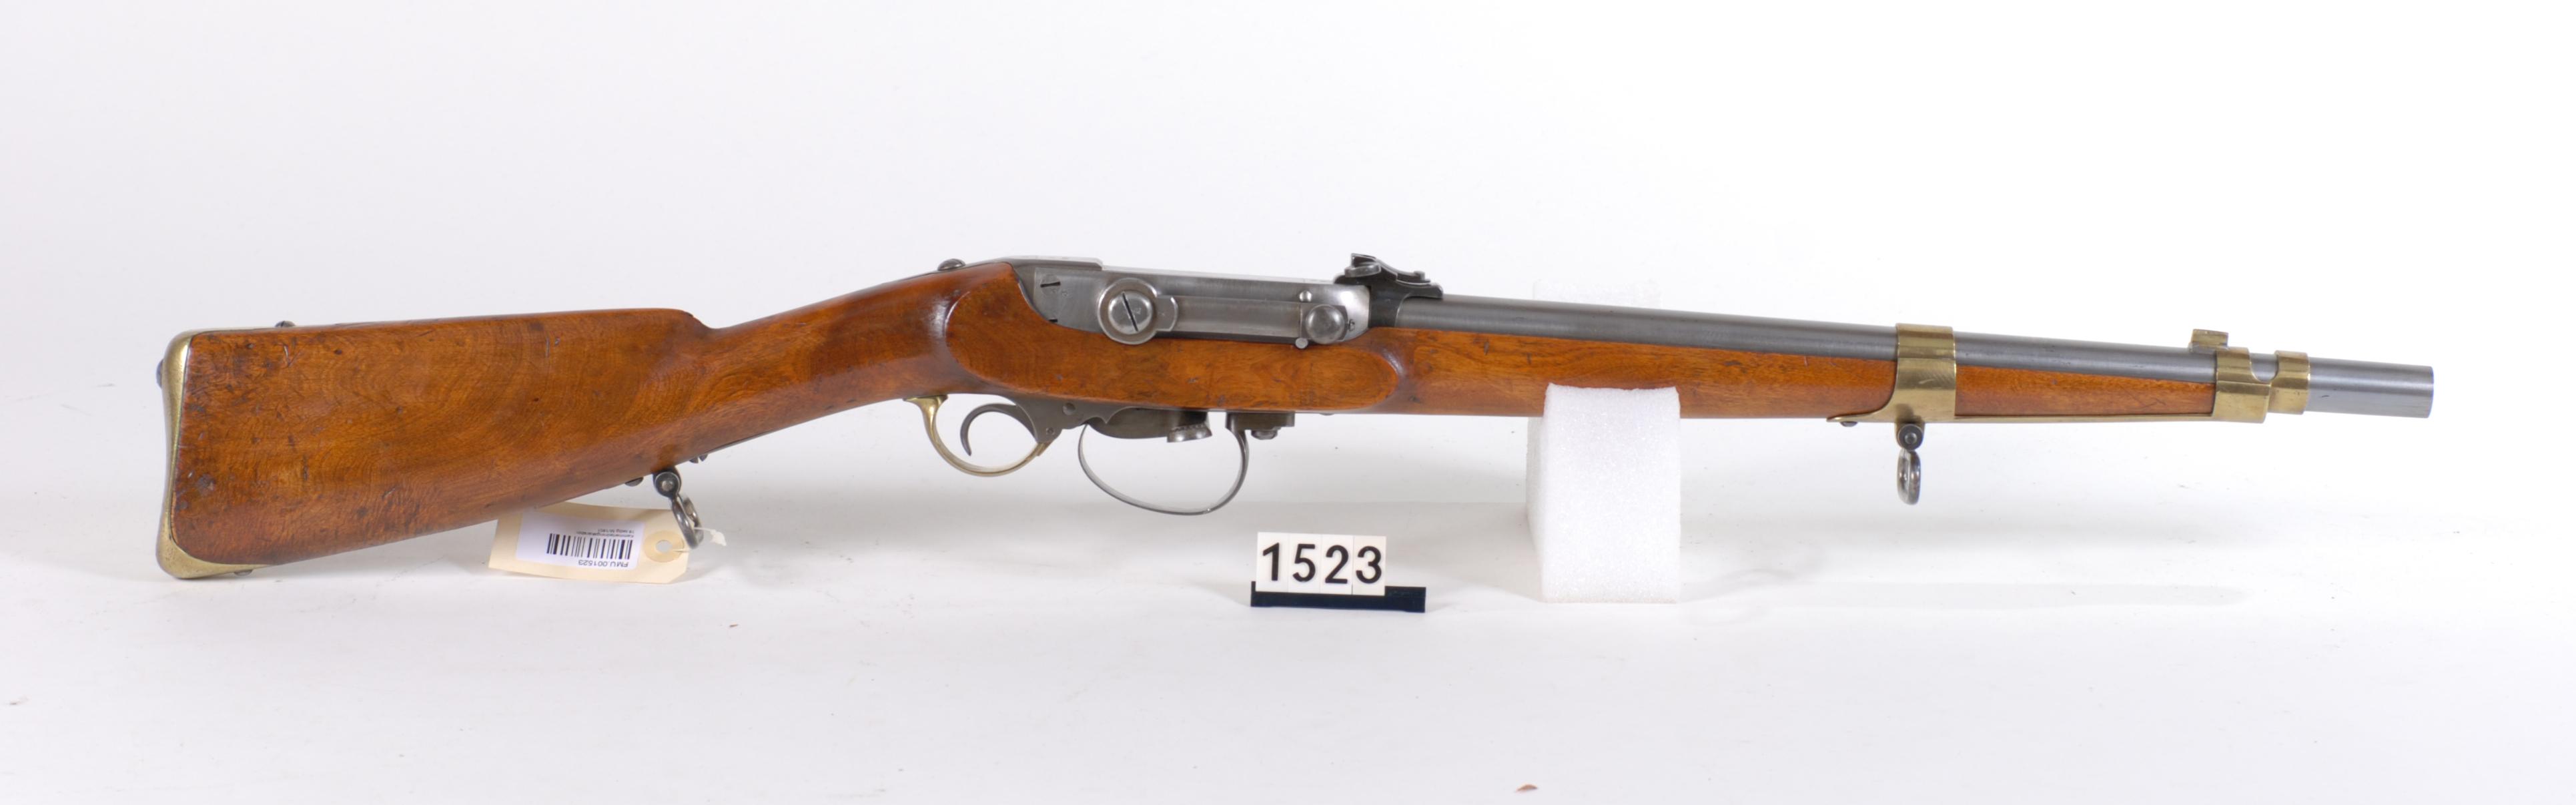 [Image: Rifle-Kongsberg-Kammerlader-M1851-3-1.jpg]